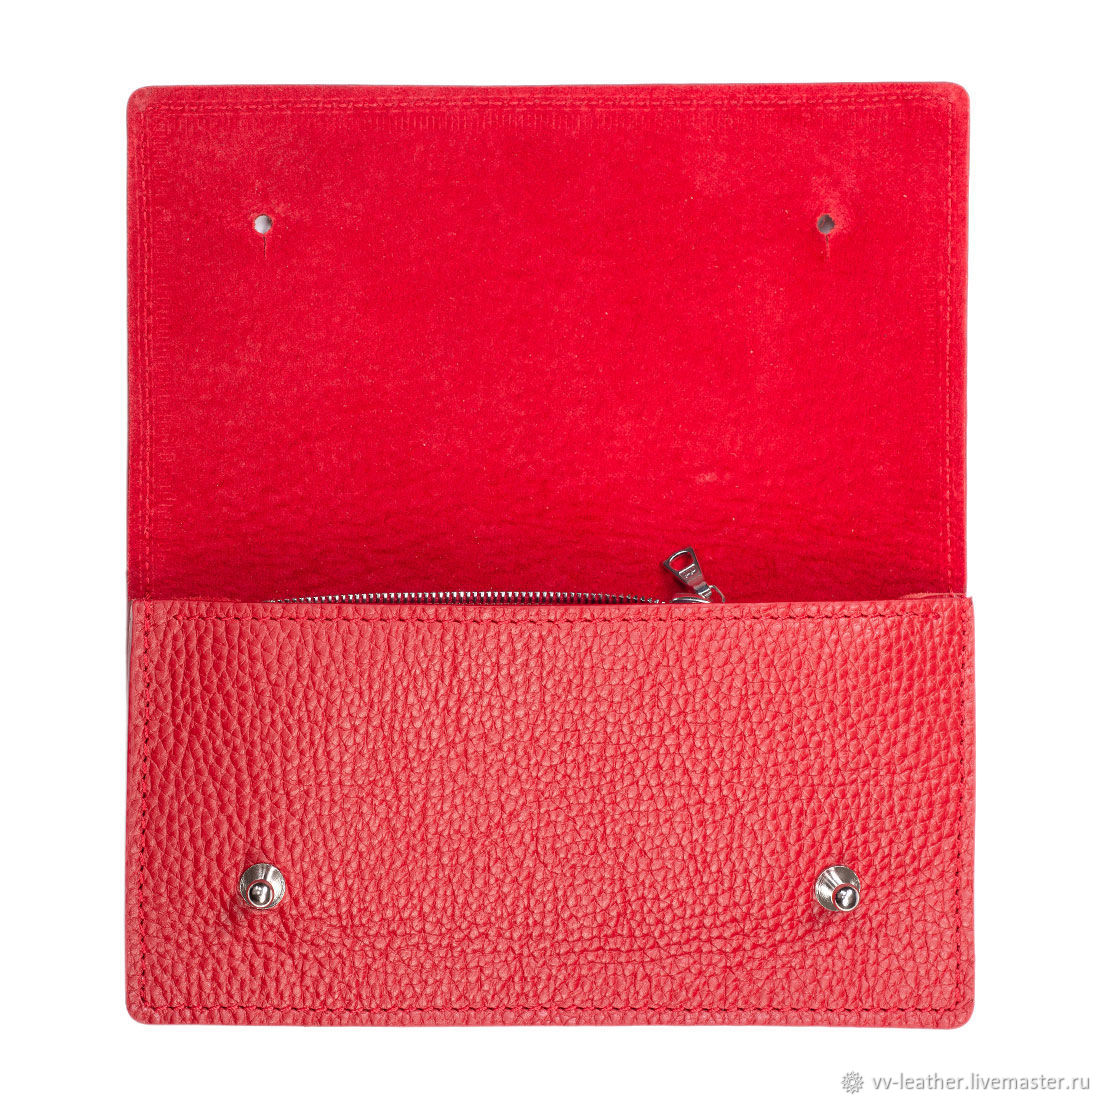 Women's clutch wallet leather, Wallets, Moscow,  Фото №1